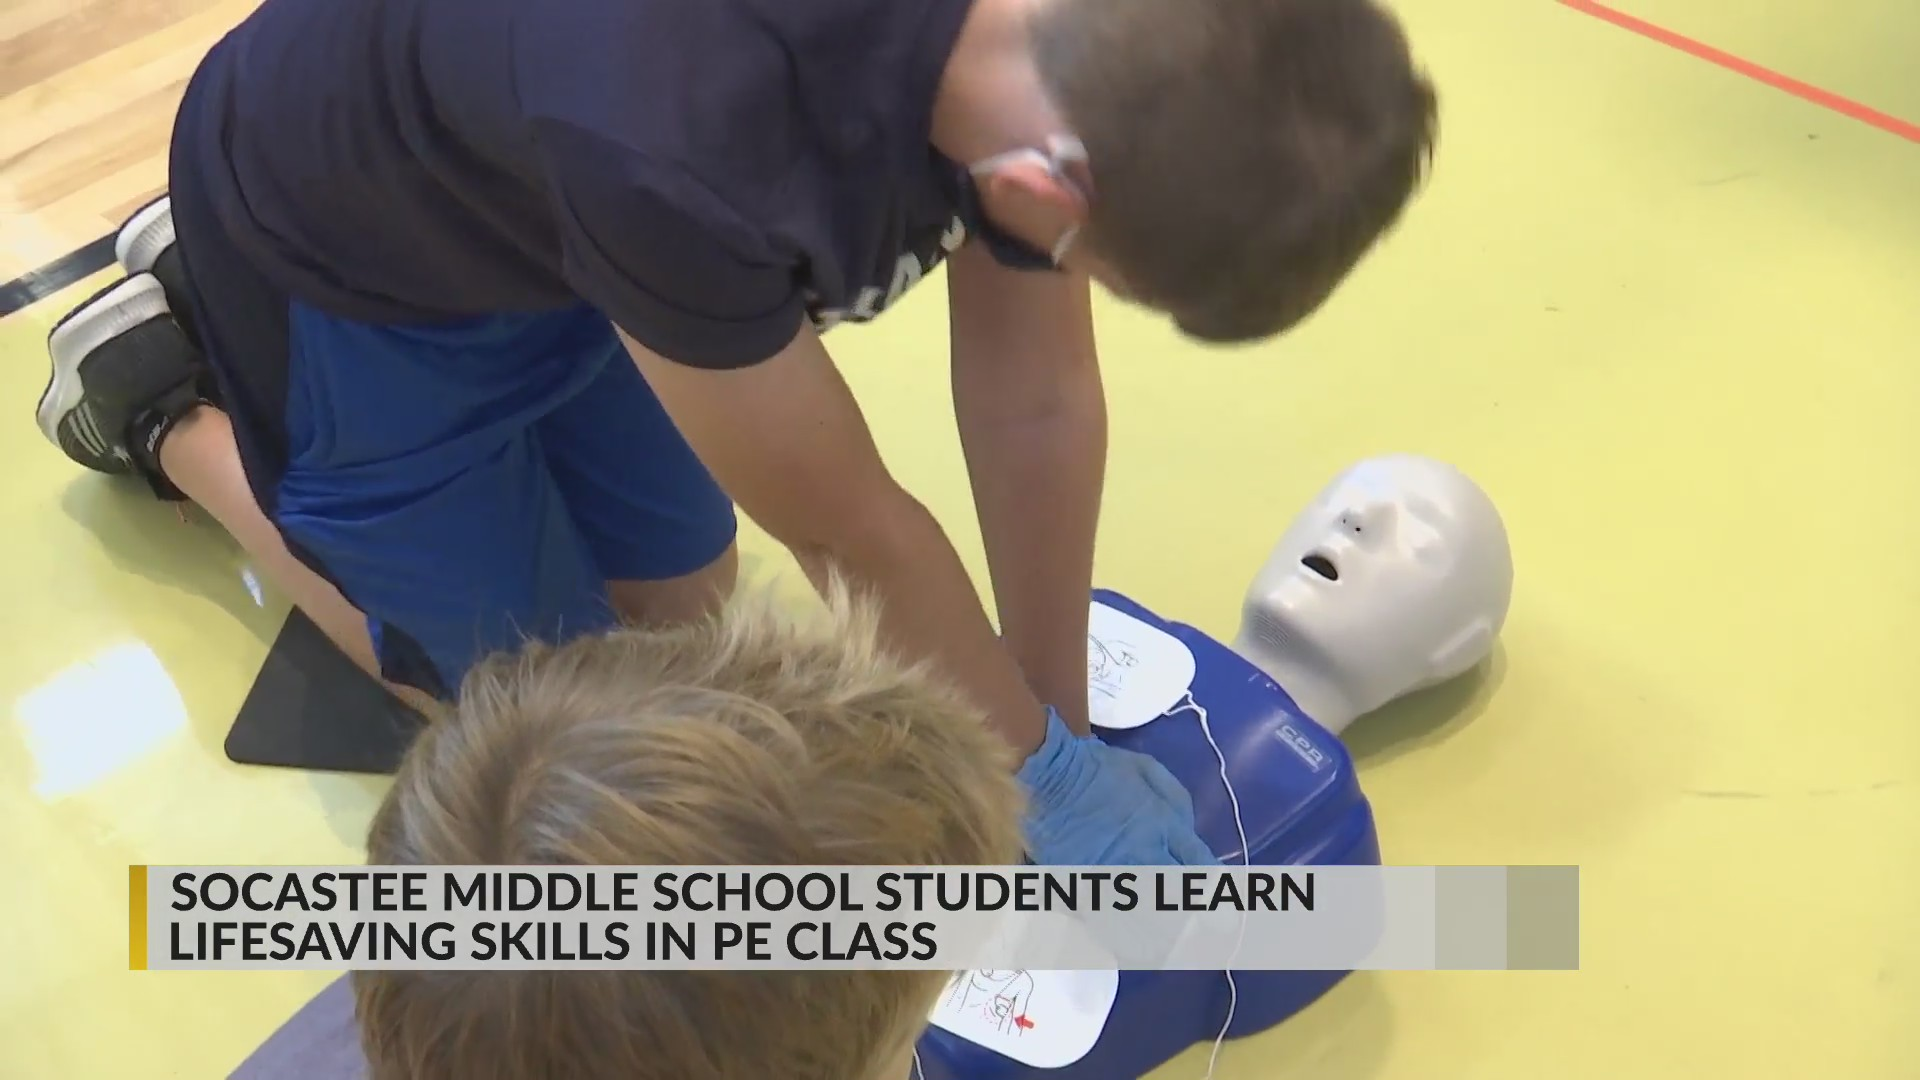 Socastee Middle School students get life-saving skills training